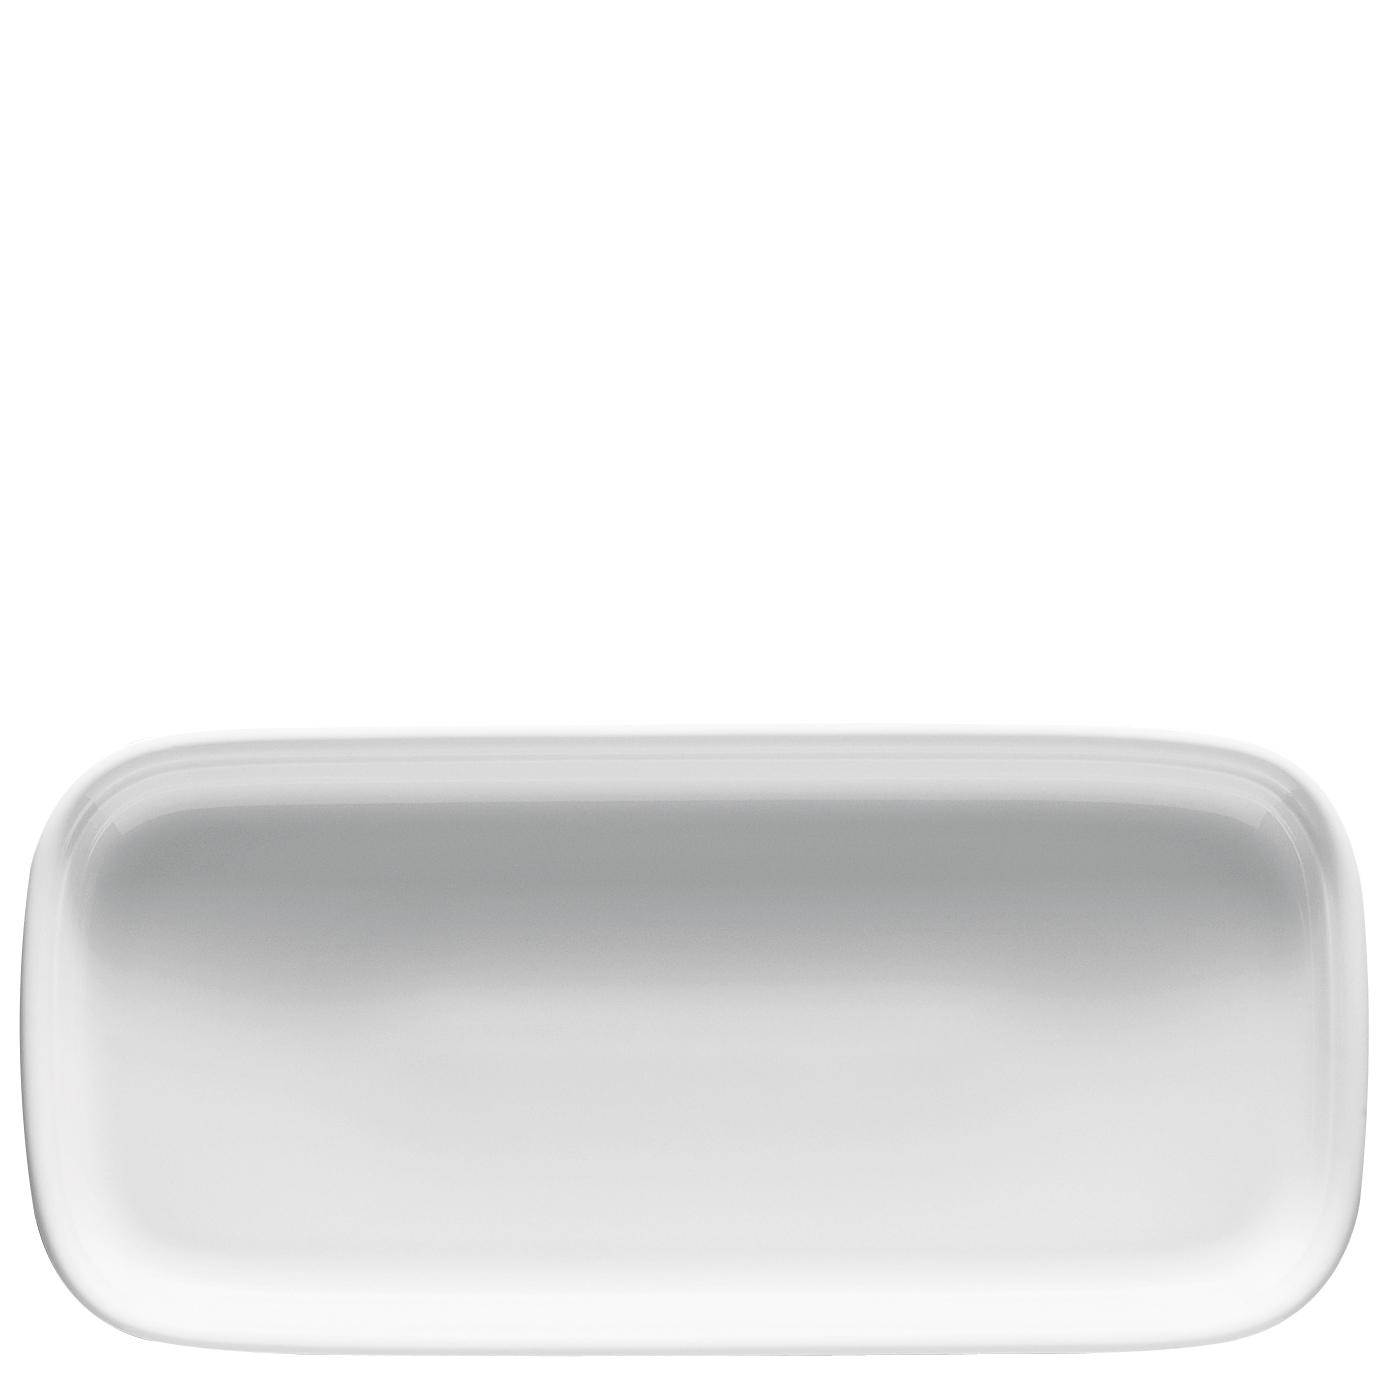 Kuchenplatte rechteckig Trend Weiss Thomas Porzellan